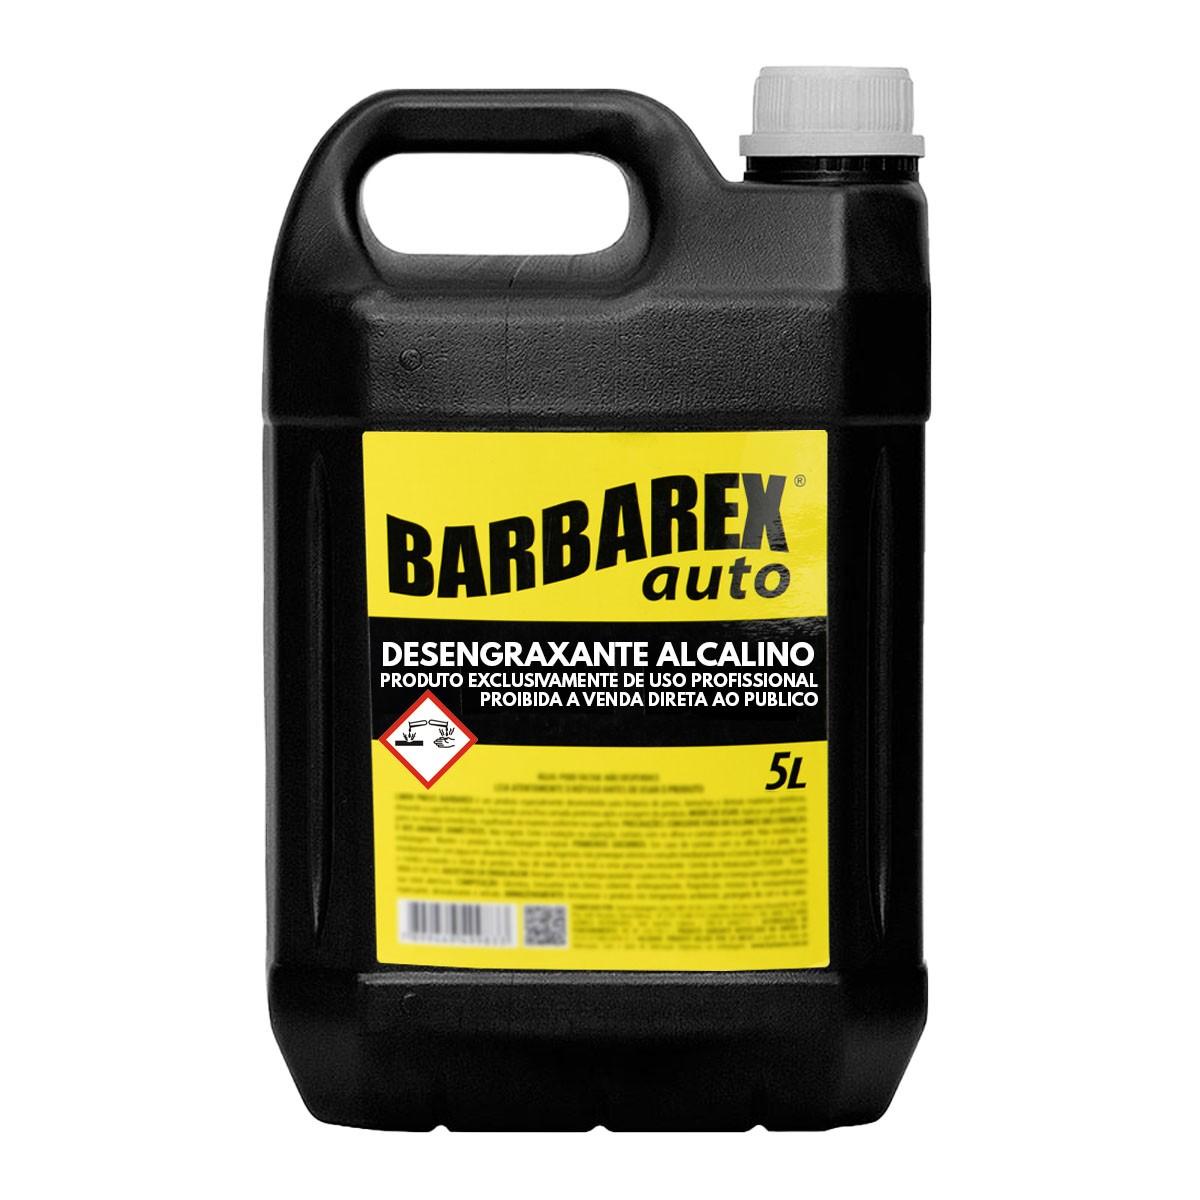 Barbarex Auto Desengraxante Alcalino 5 Litros